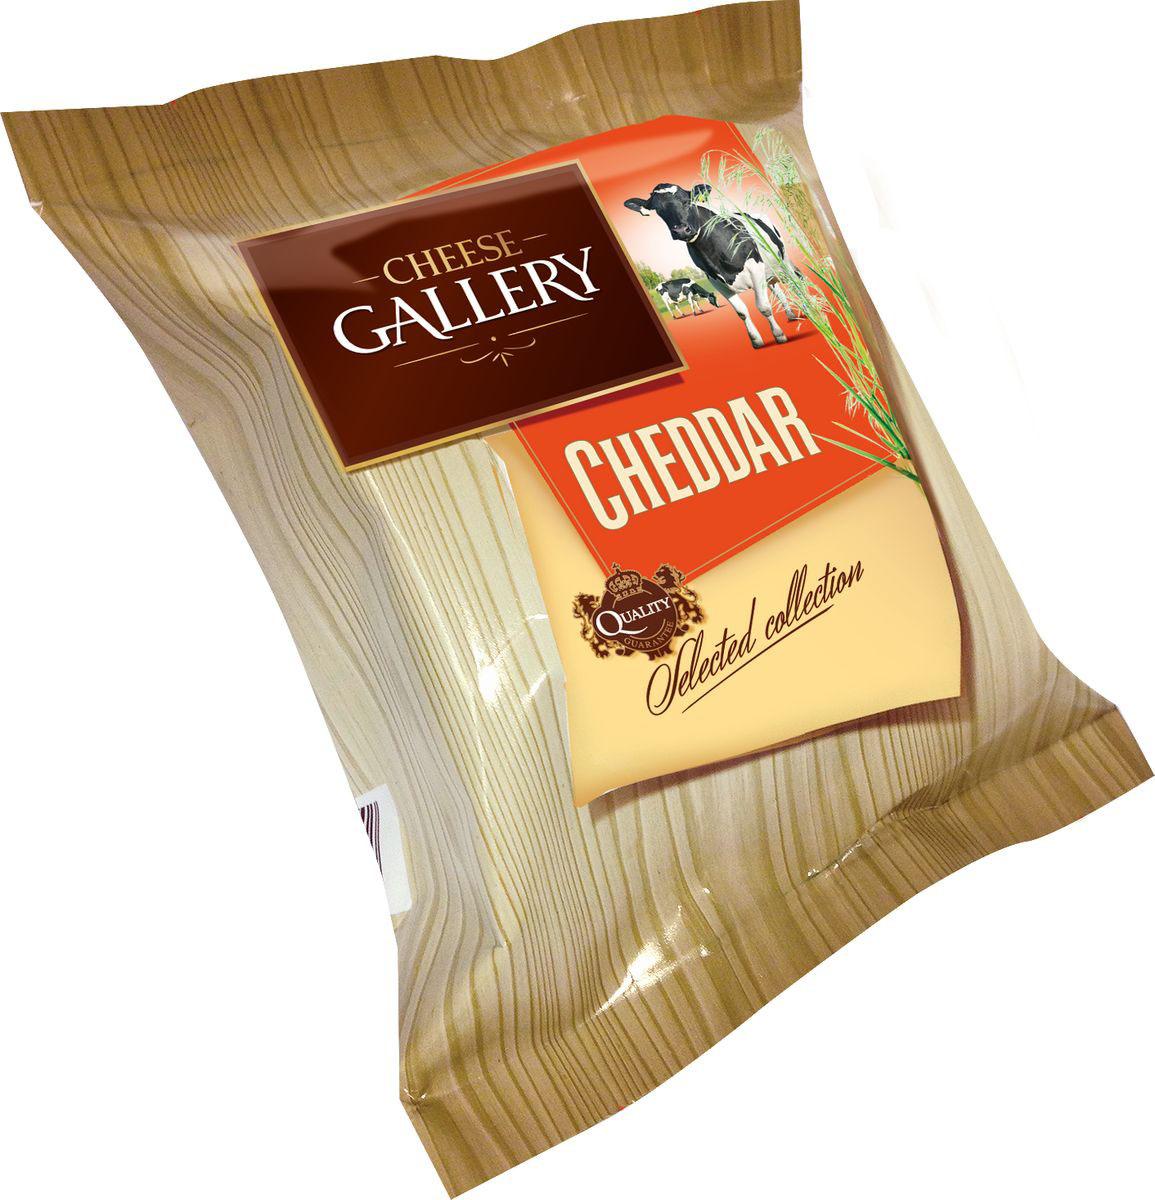 Cheese Gallery Сыр Чеддер красный, 45%, 250 г cheese gallery